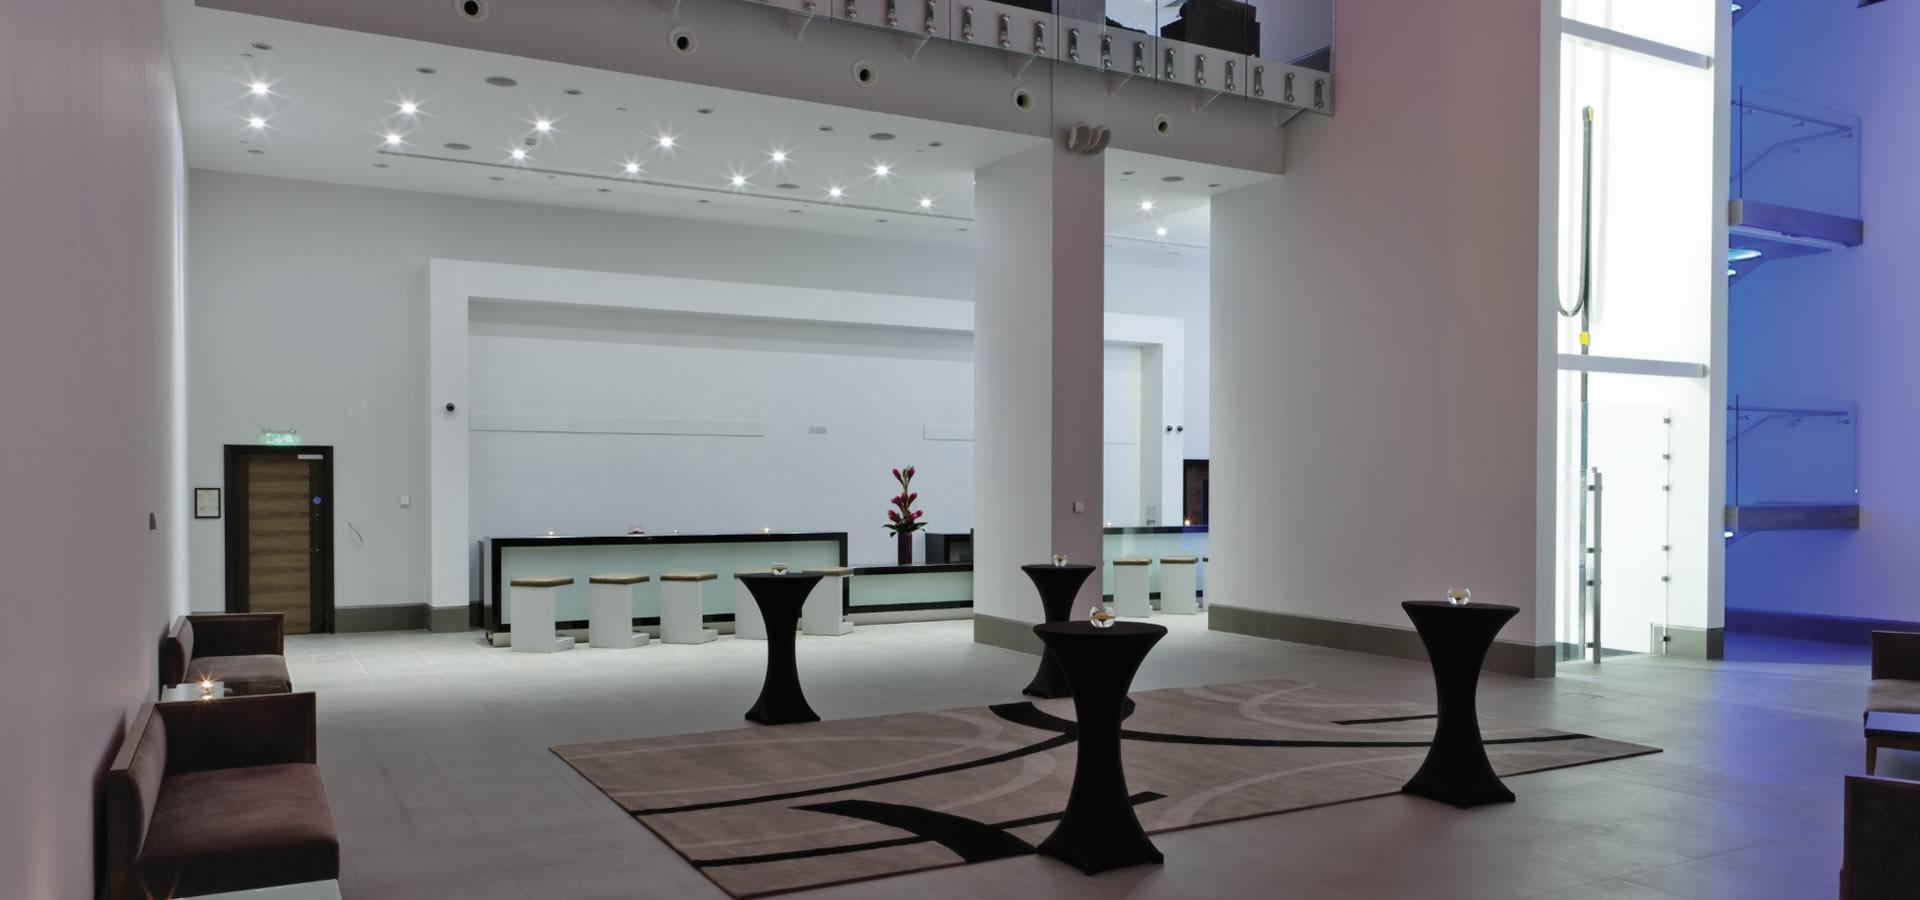 Fullsize Of What Is An Atrium